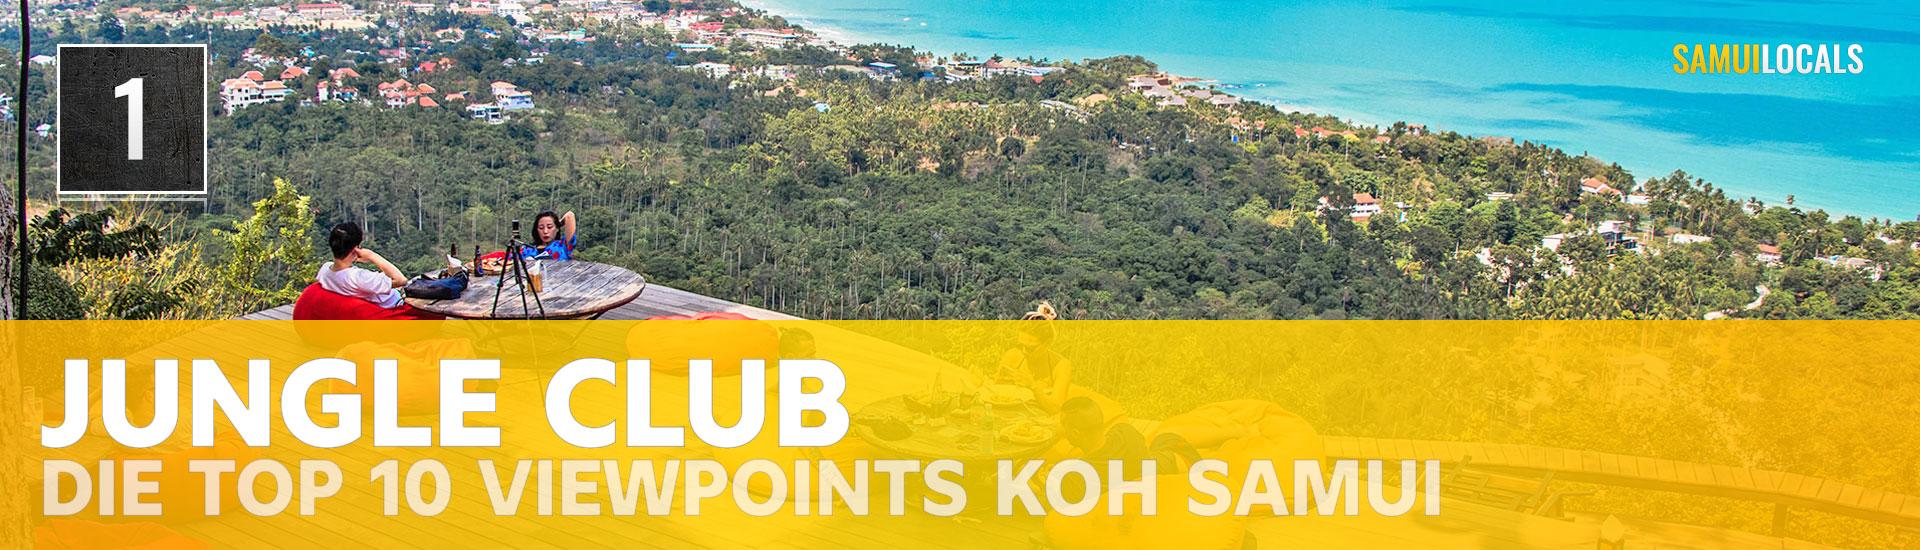 viewpoint_koh_samui_jungle_club